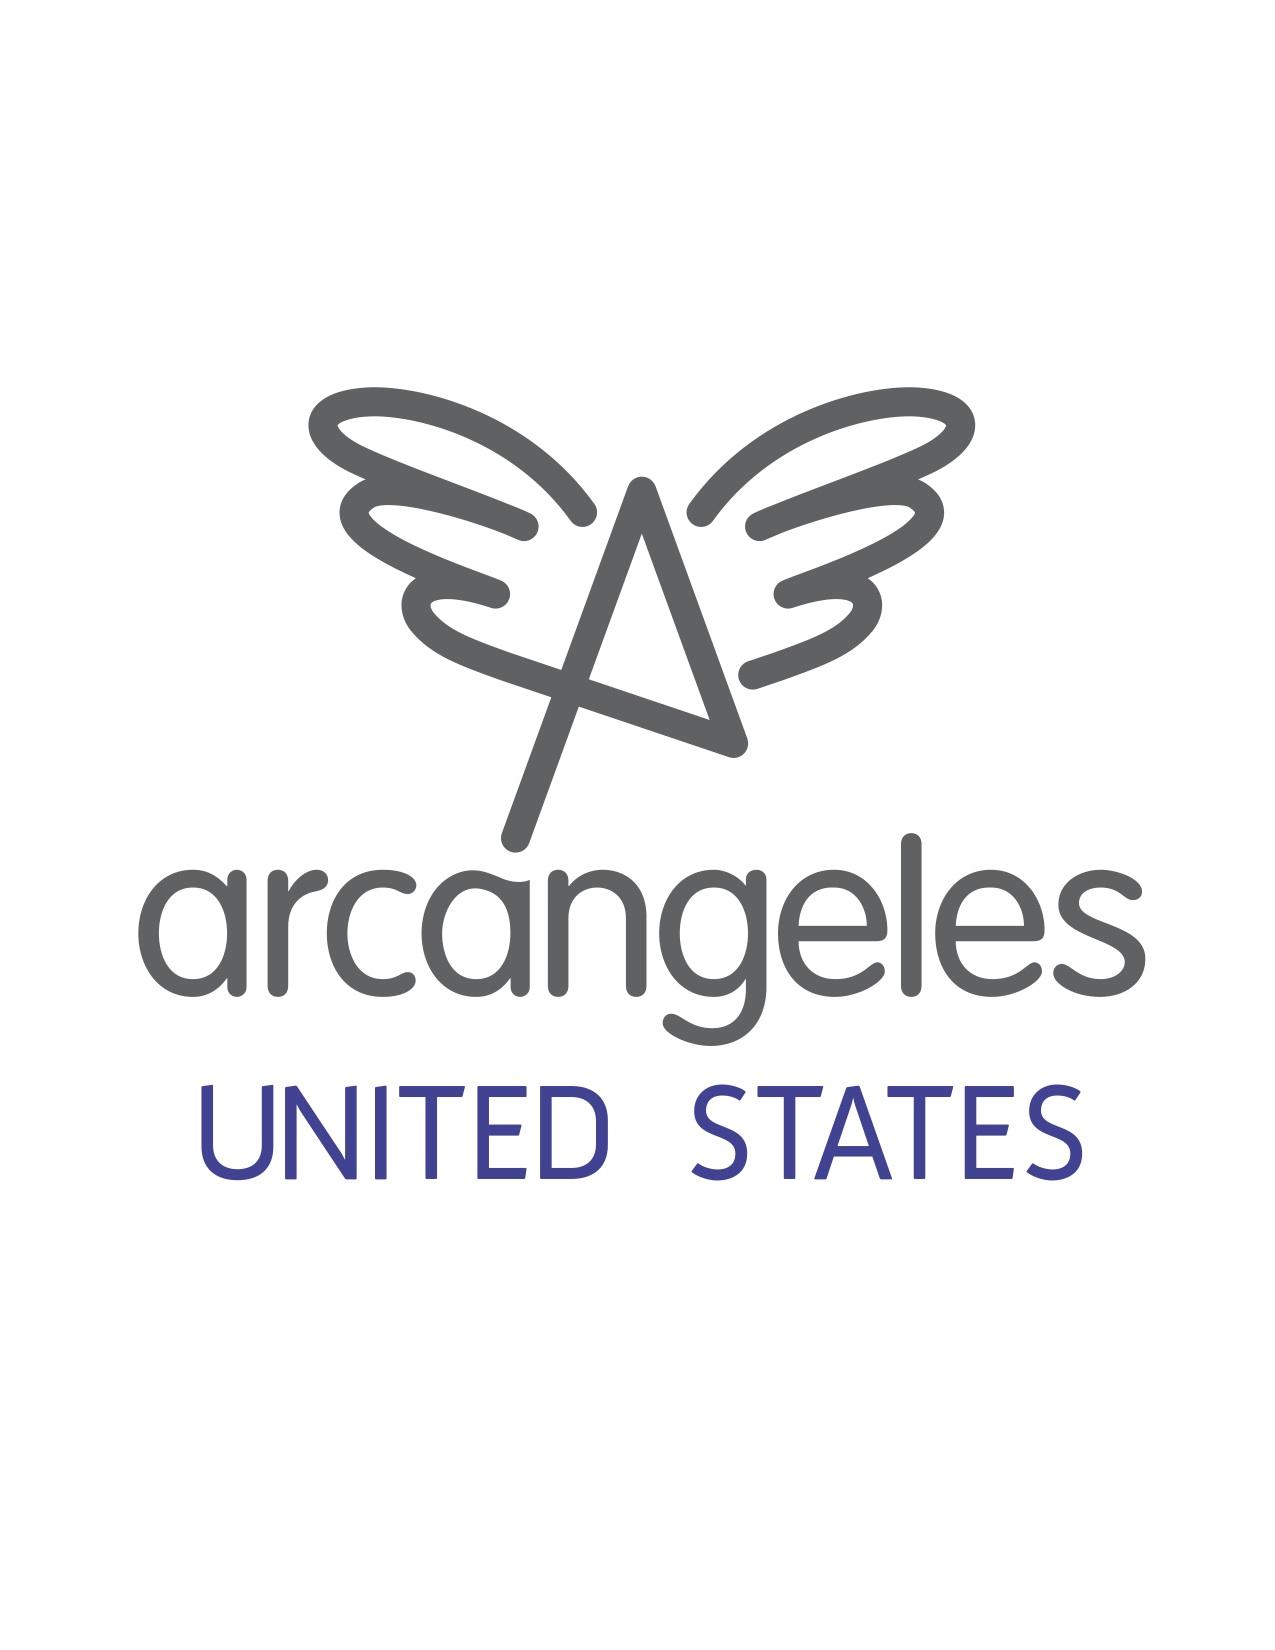 Logo ArcangelesUSA.jpg